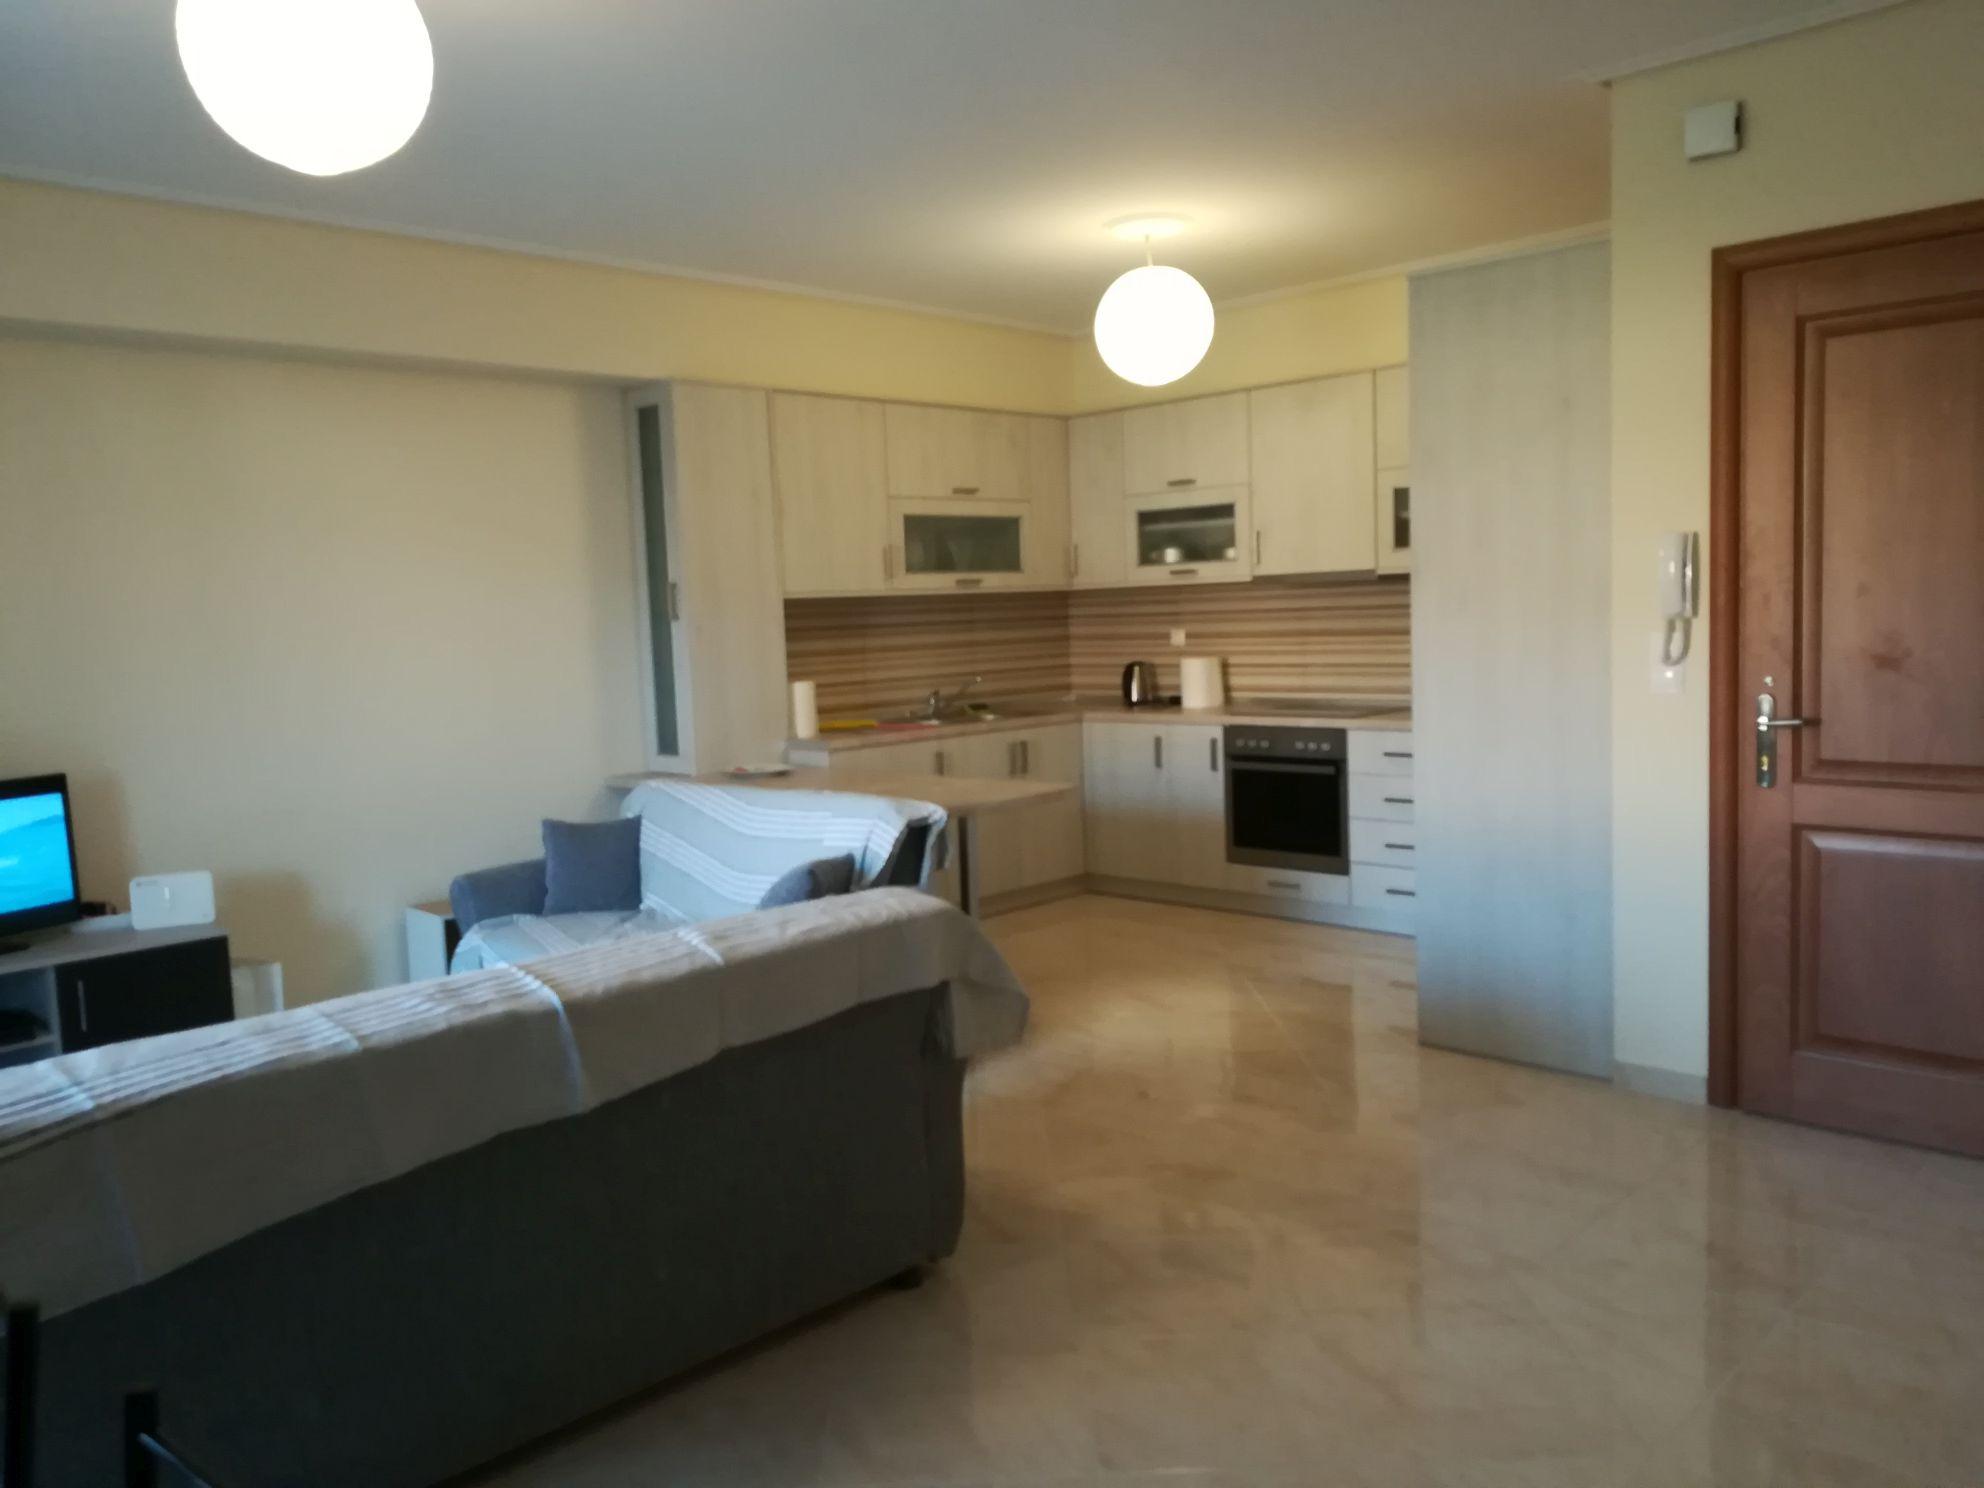 Samos Option 13 (62 Sq.M-1 Bedroom)